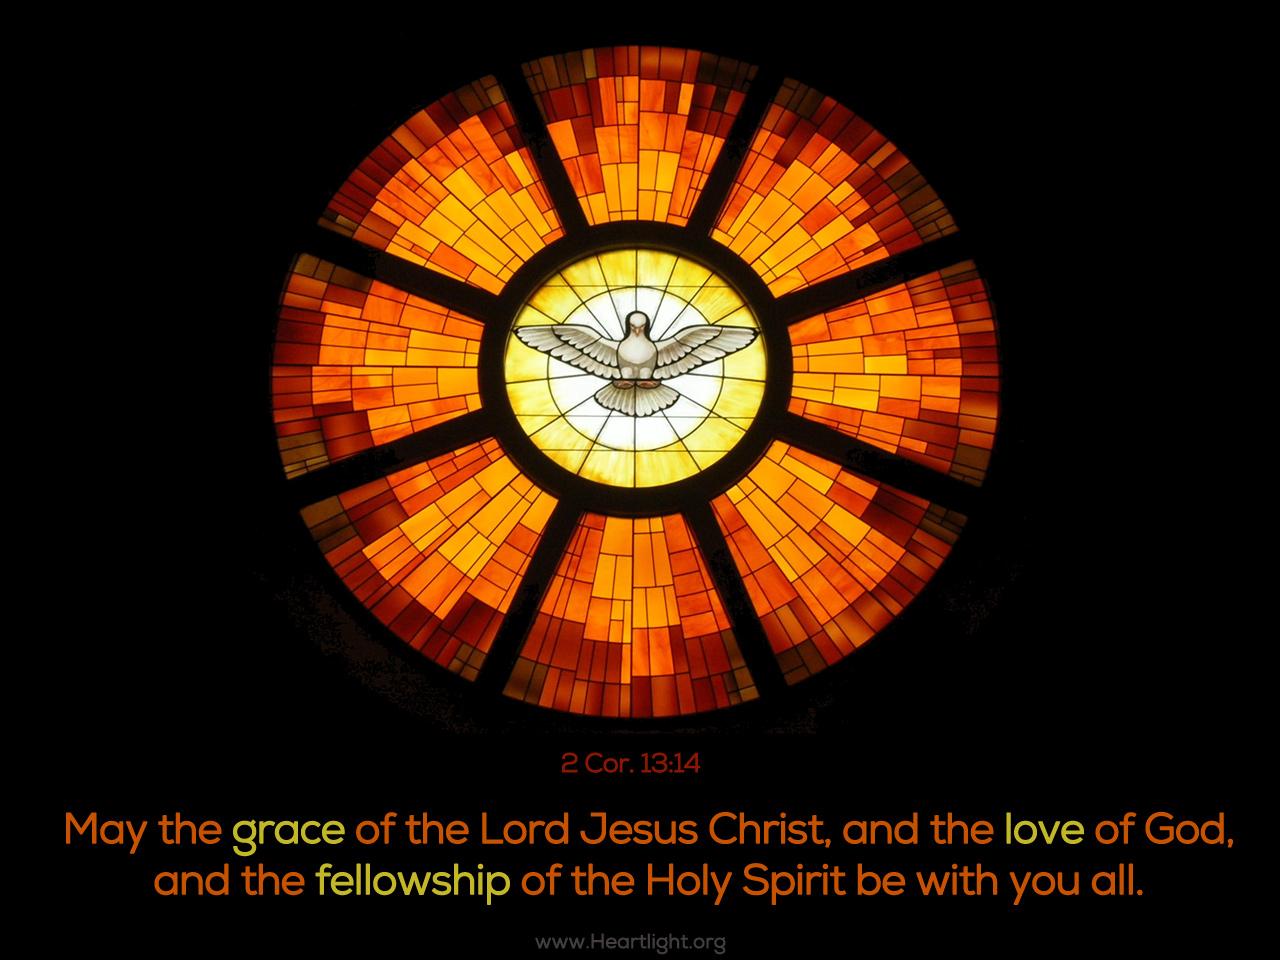 Inspirational illustration of 2 Corinthians 13:14